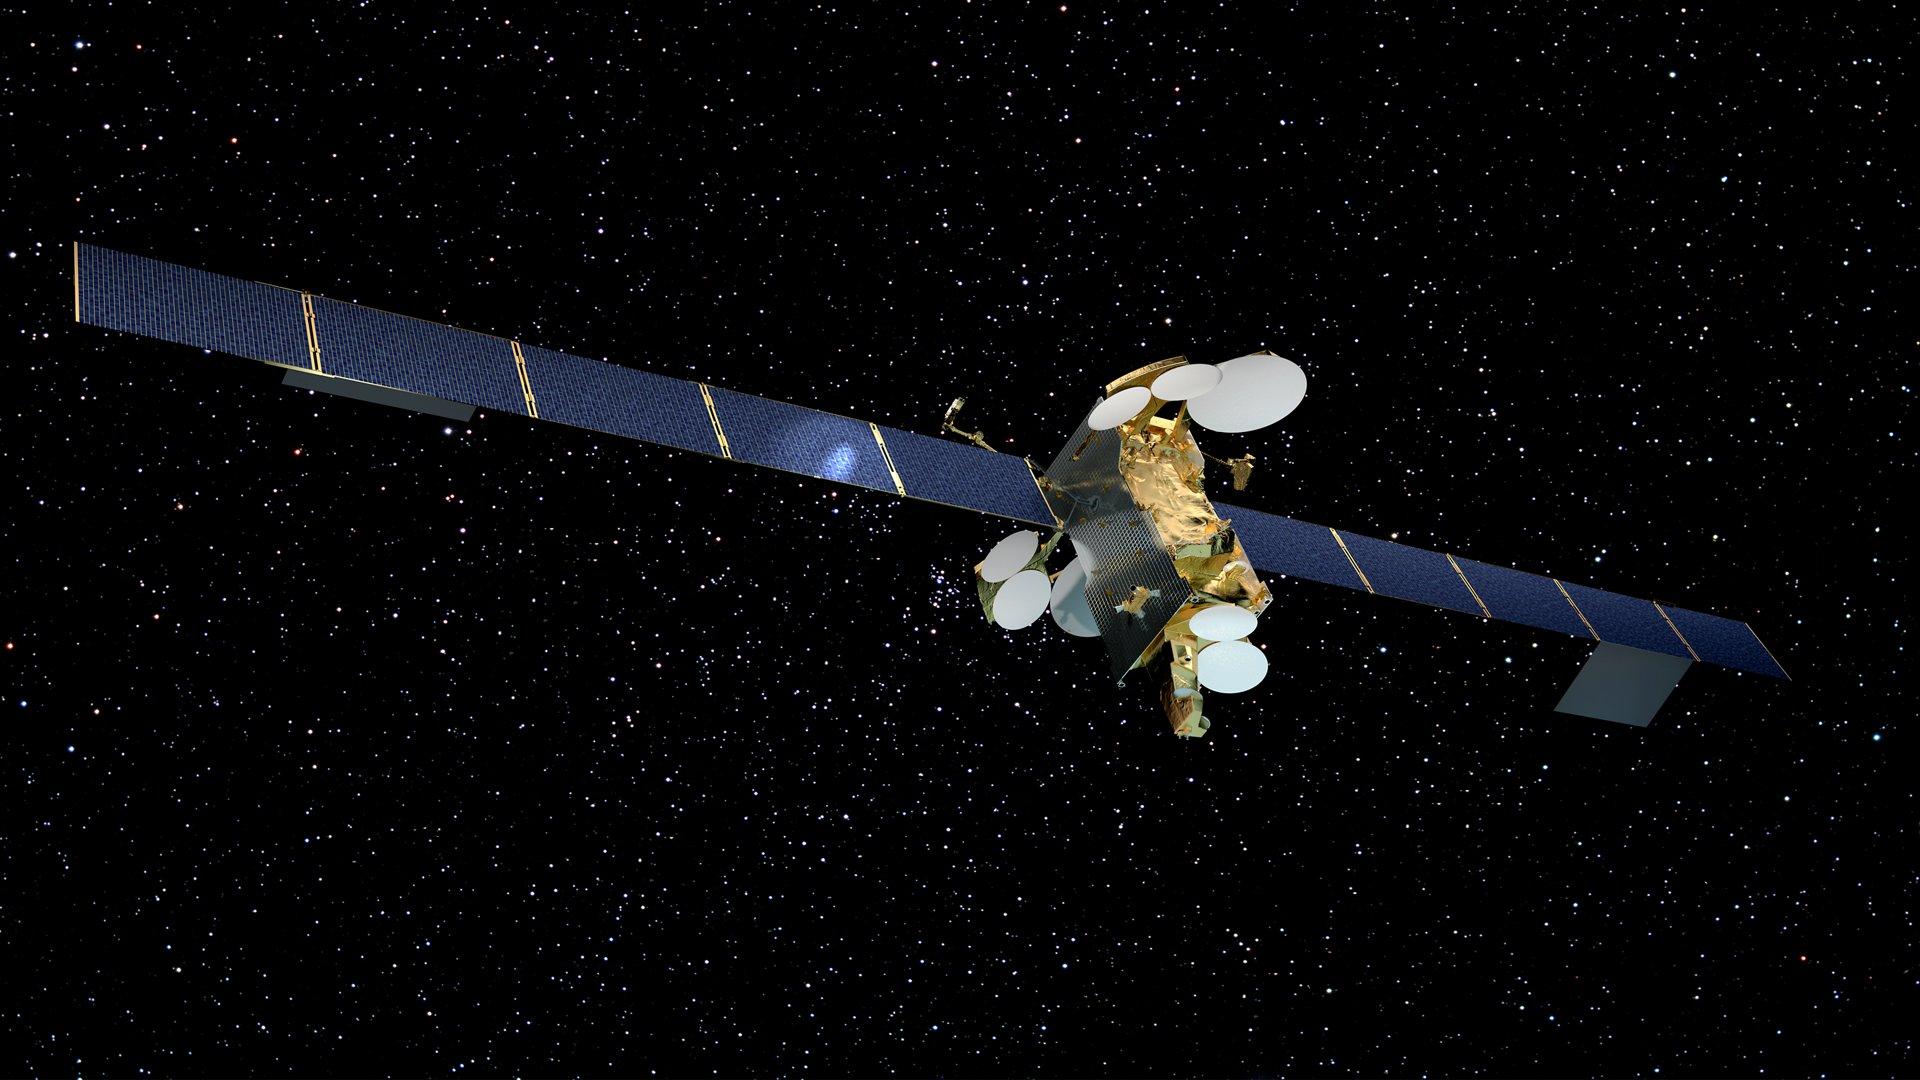 Airbus-built telecommunication satelllite SES-12 - Artist View